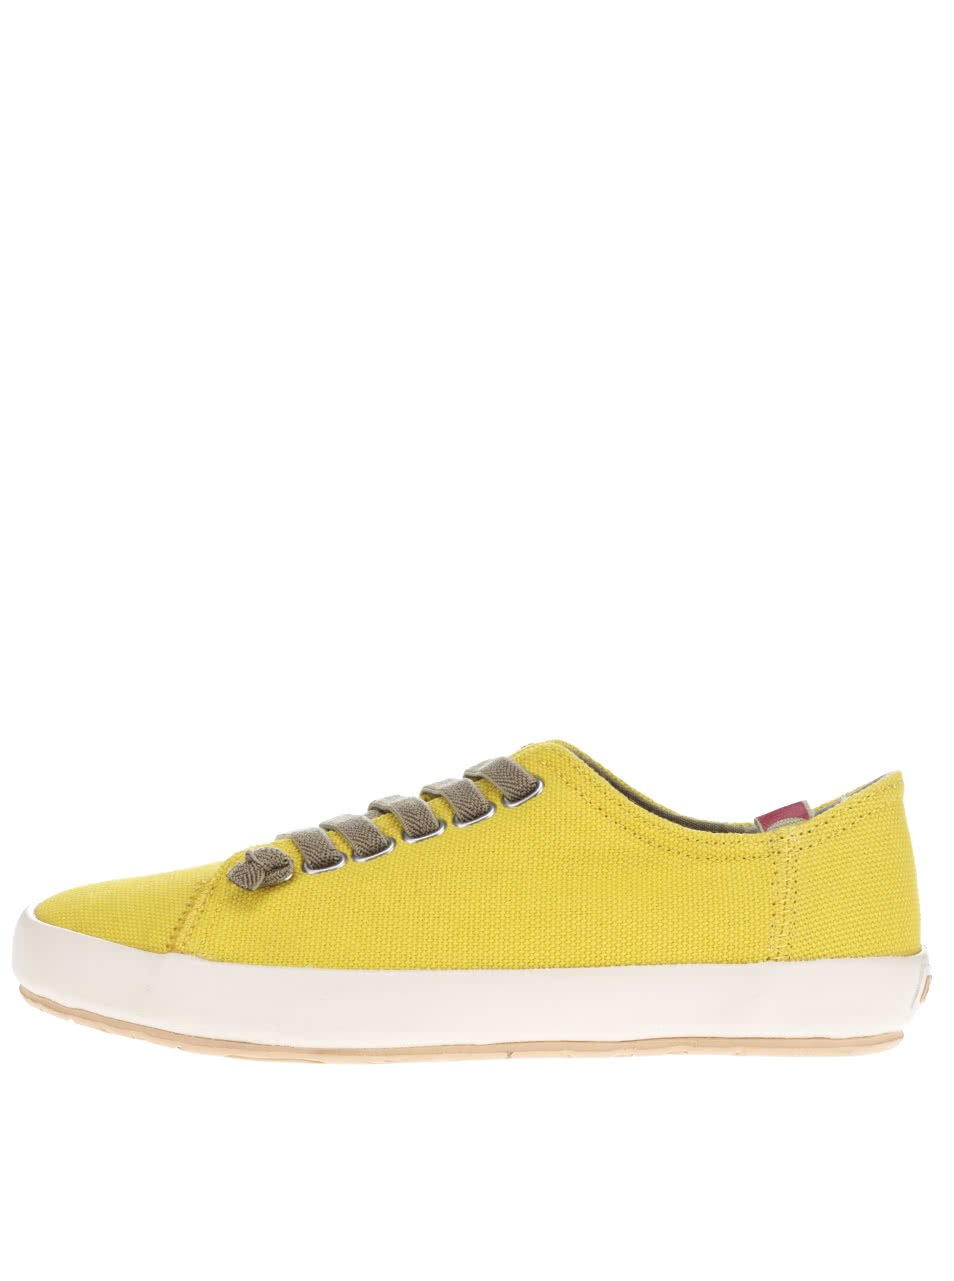 Žluté dámské tenisky Camper